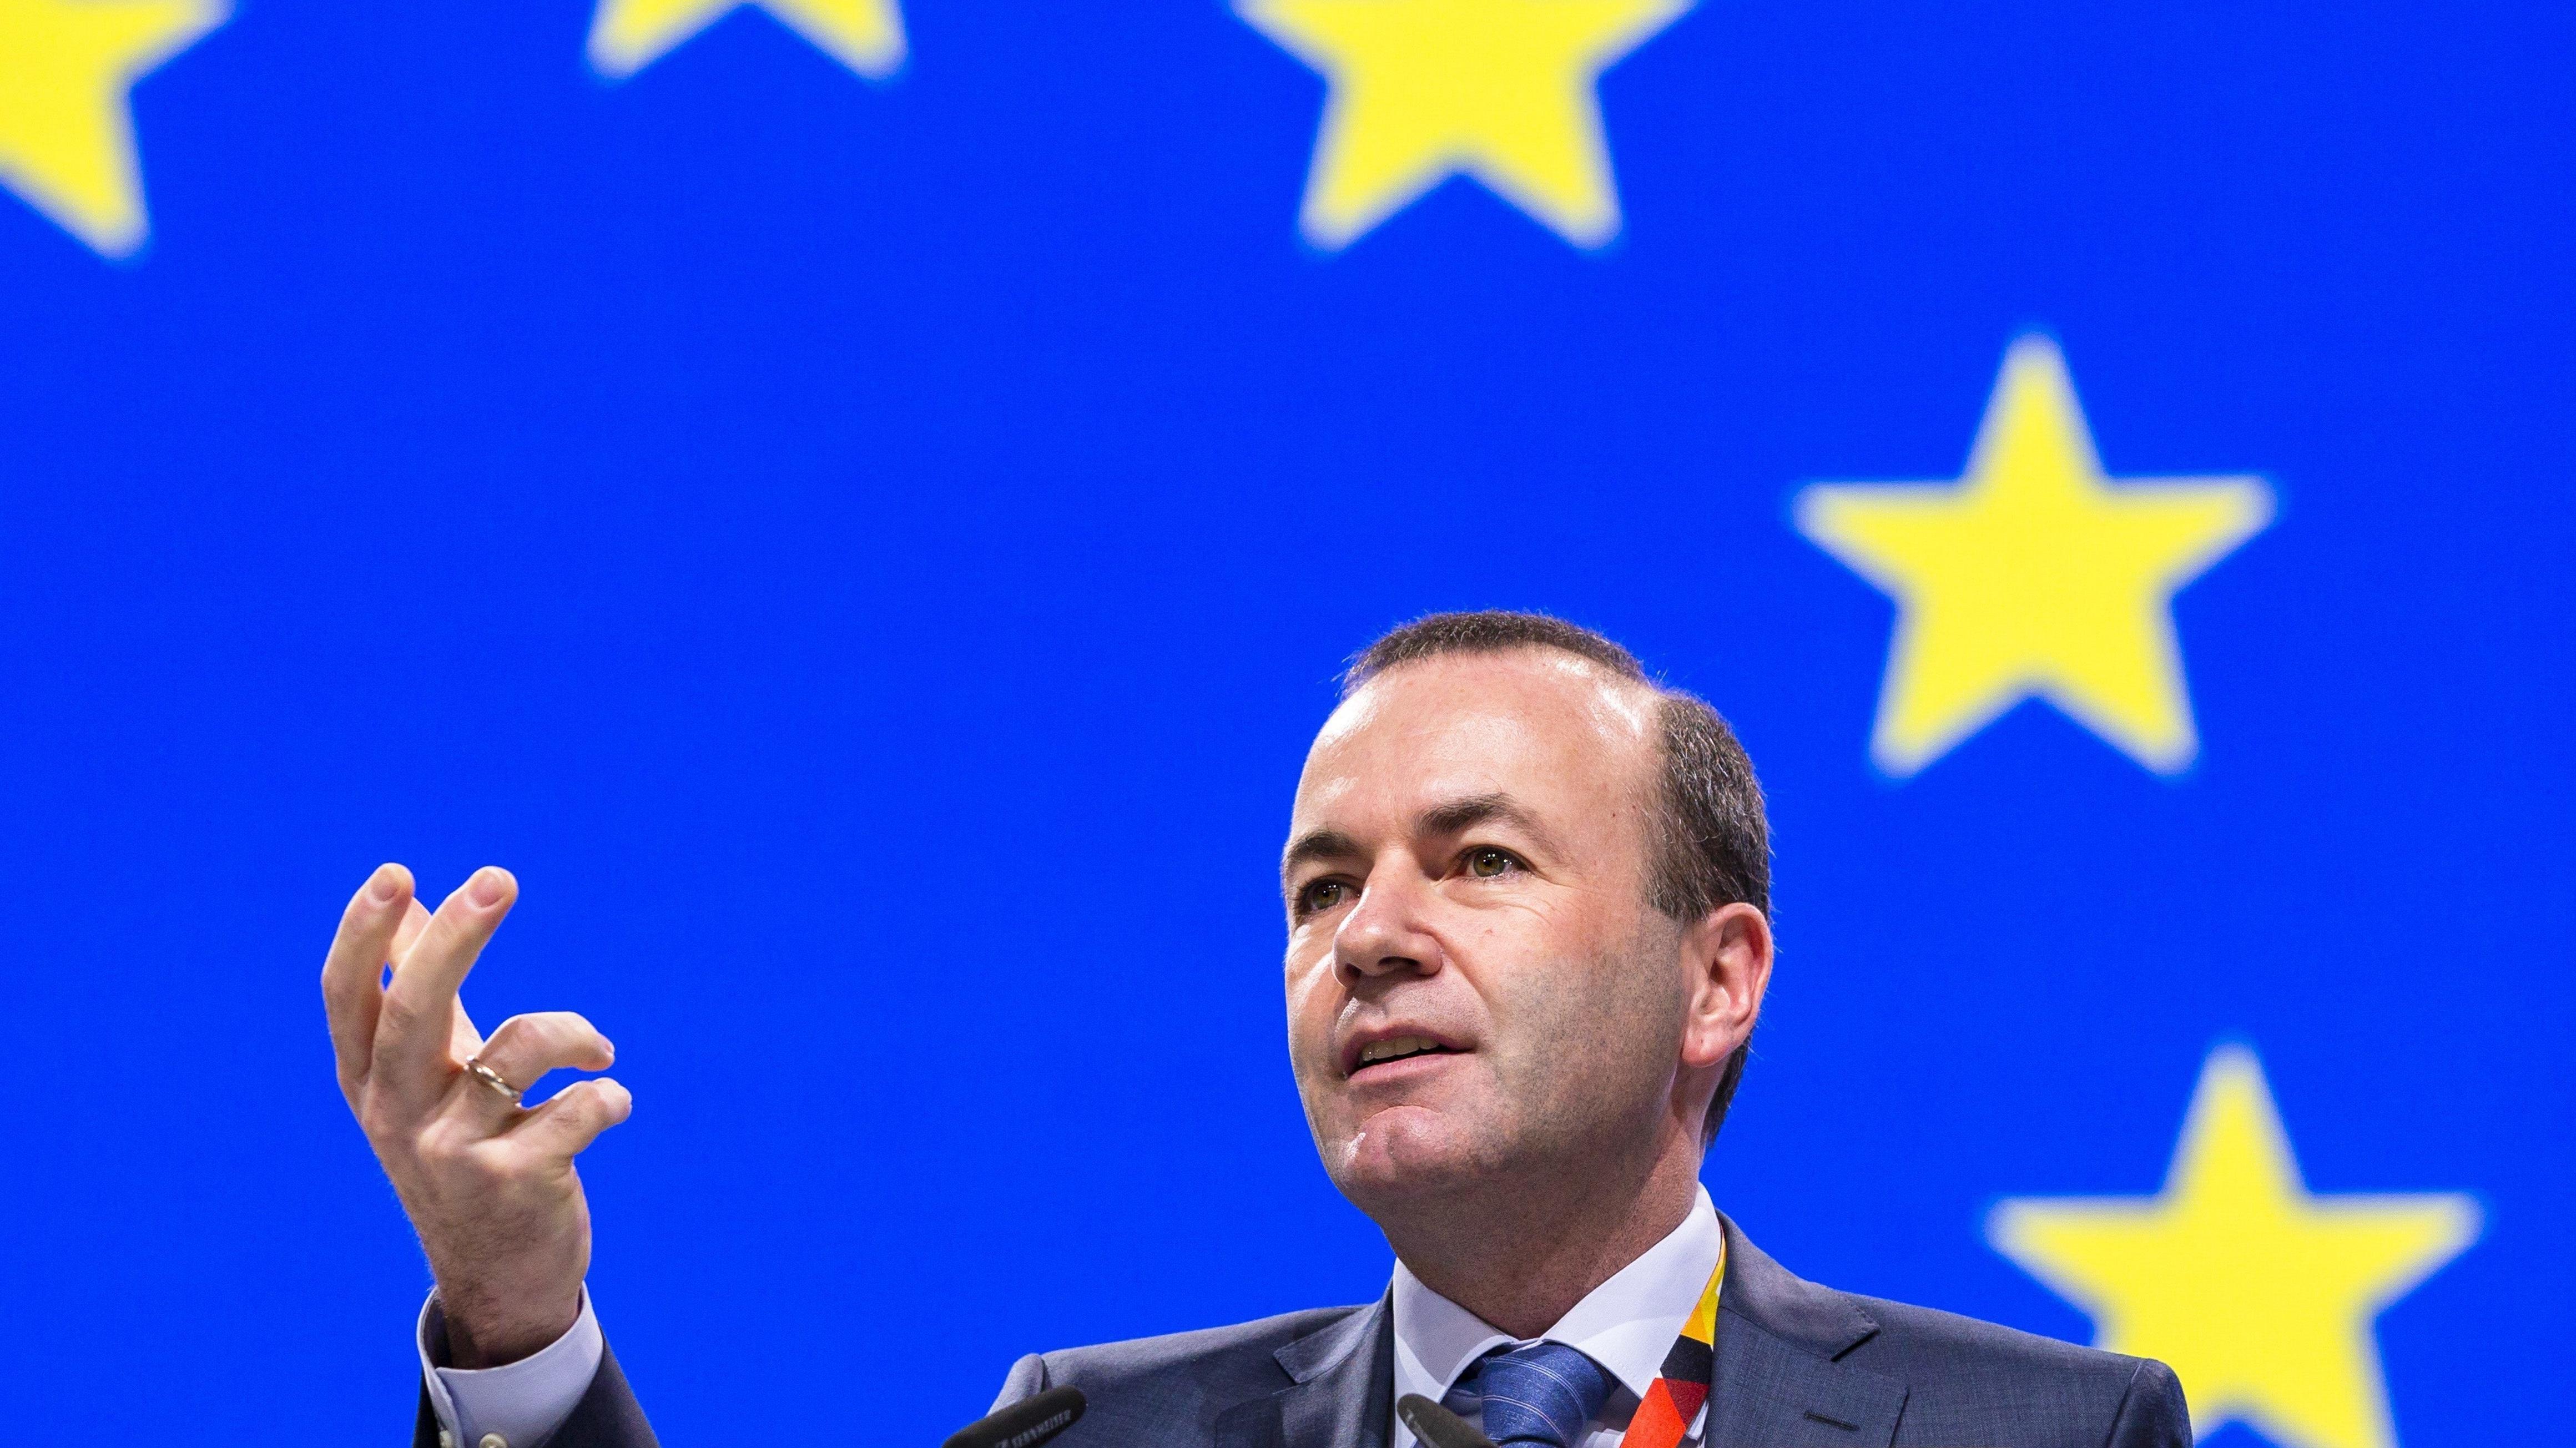 EU-Spitzenkandidat der EVP Manfred Weber